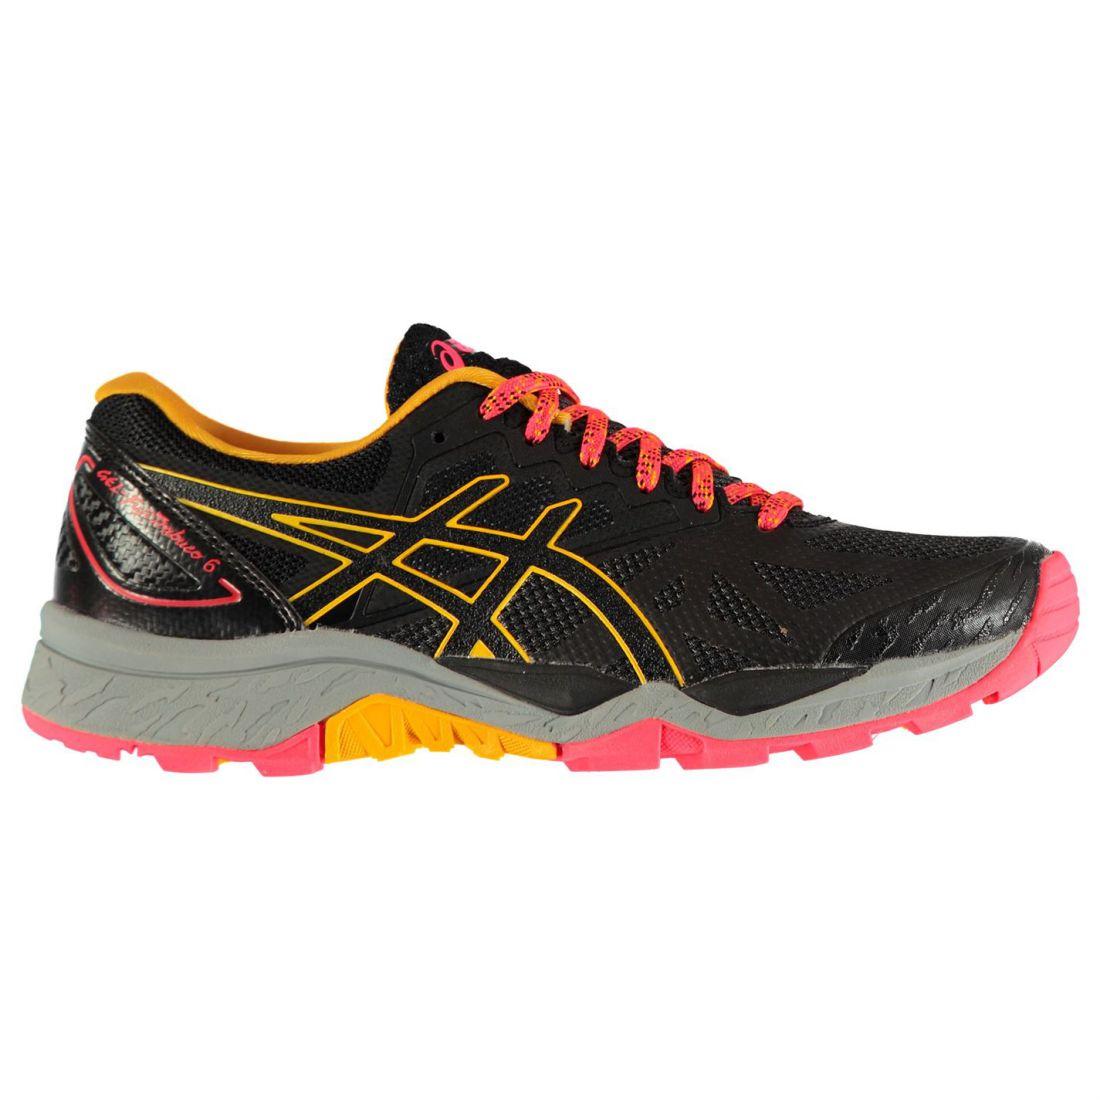 Asics Fujitrabuco 6 Trail Running shoes Ladies Lightweight